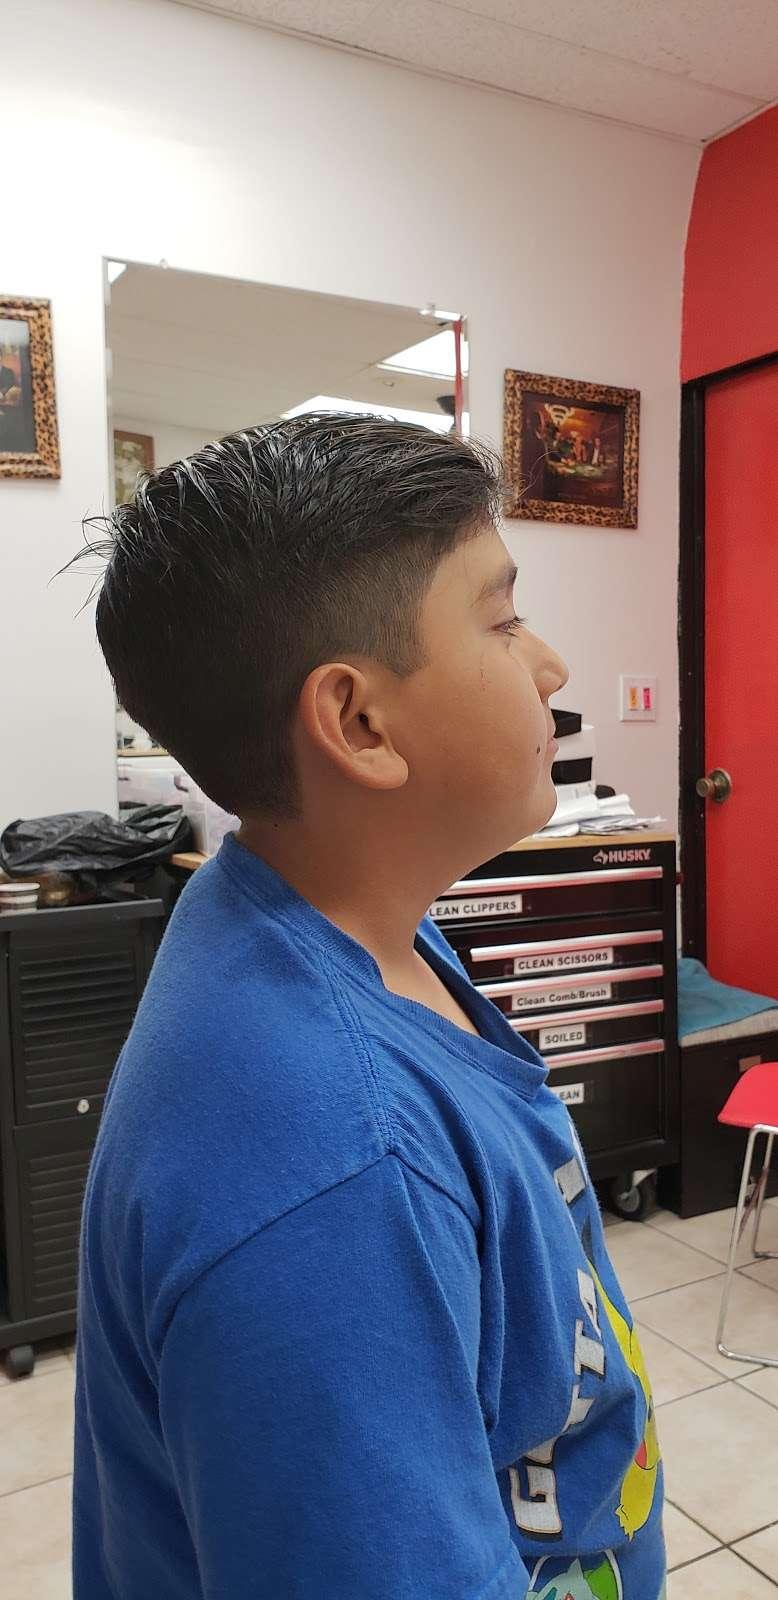 Old town barber shop - Hair care | 2205 Torrance Blvd